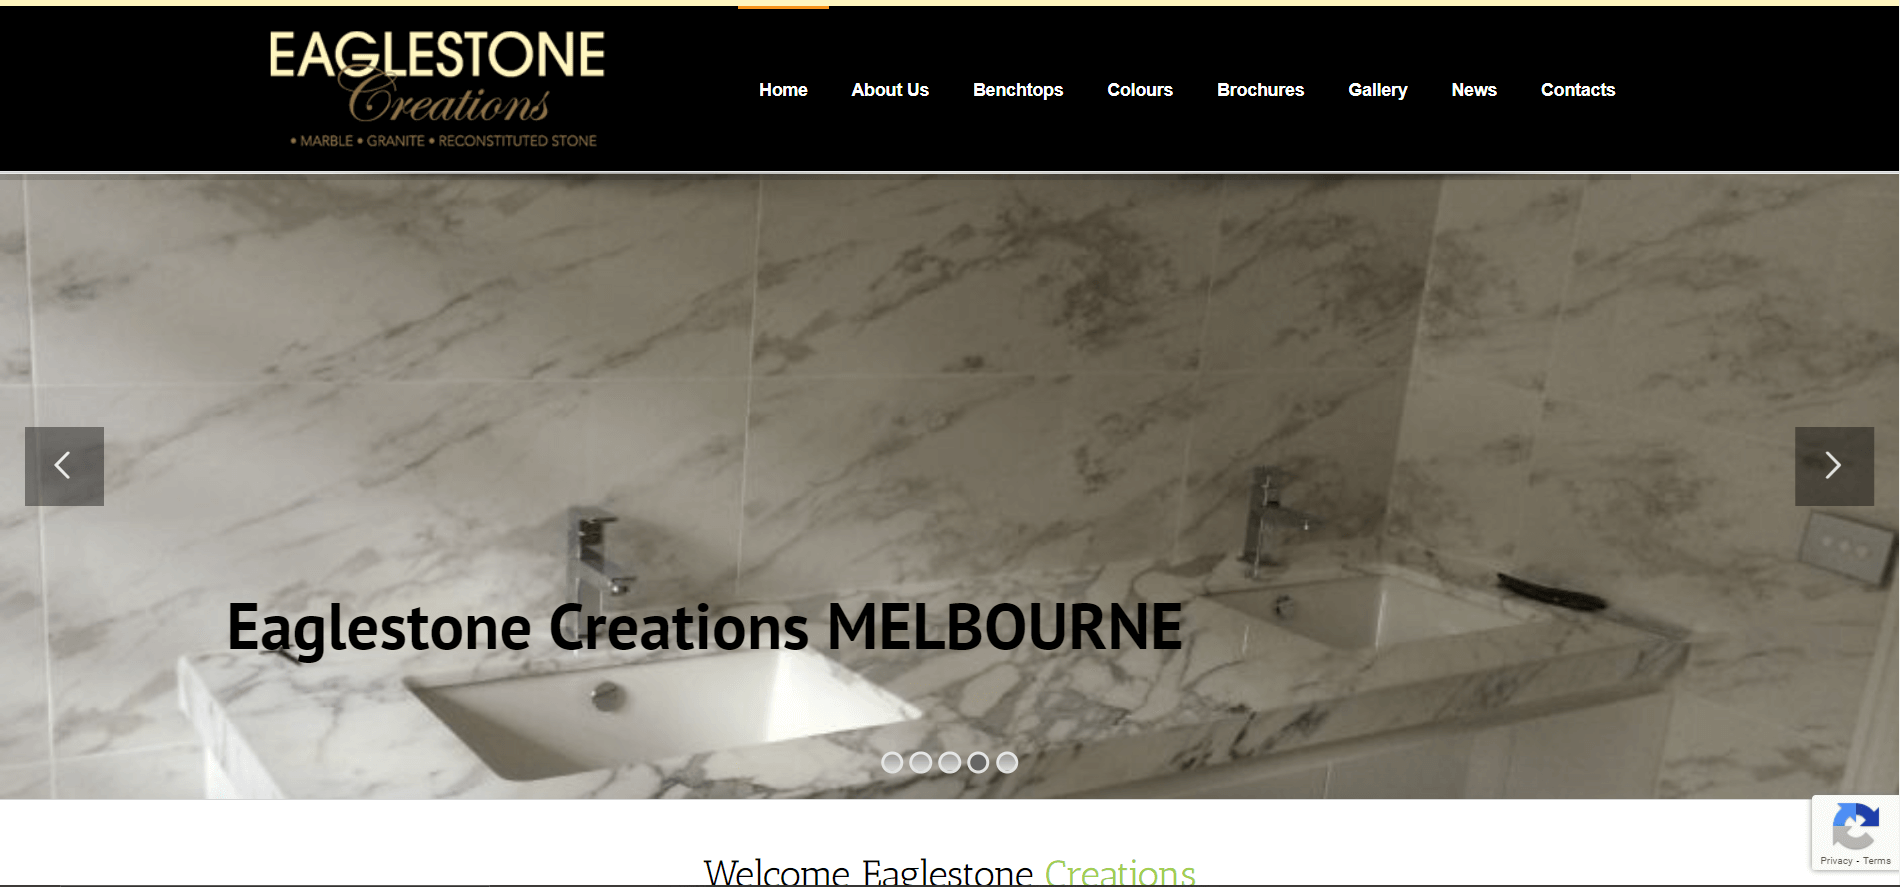 eaglestone creations